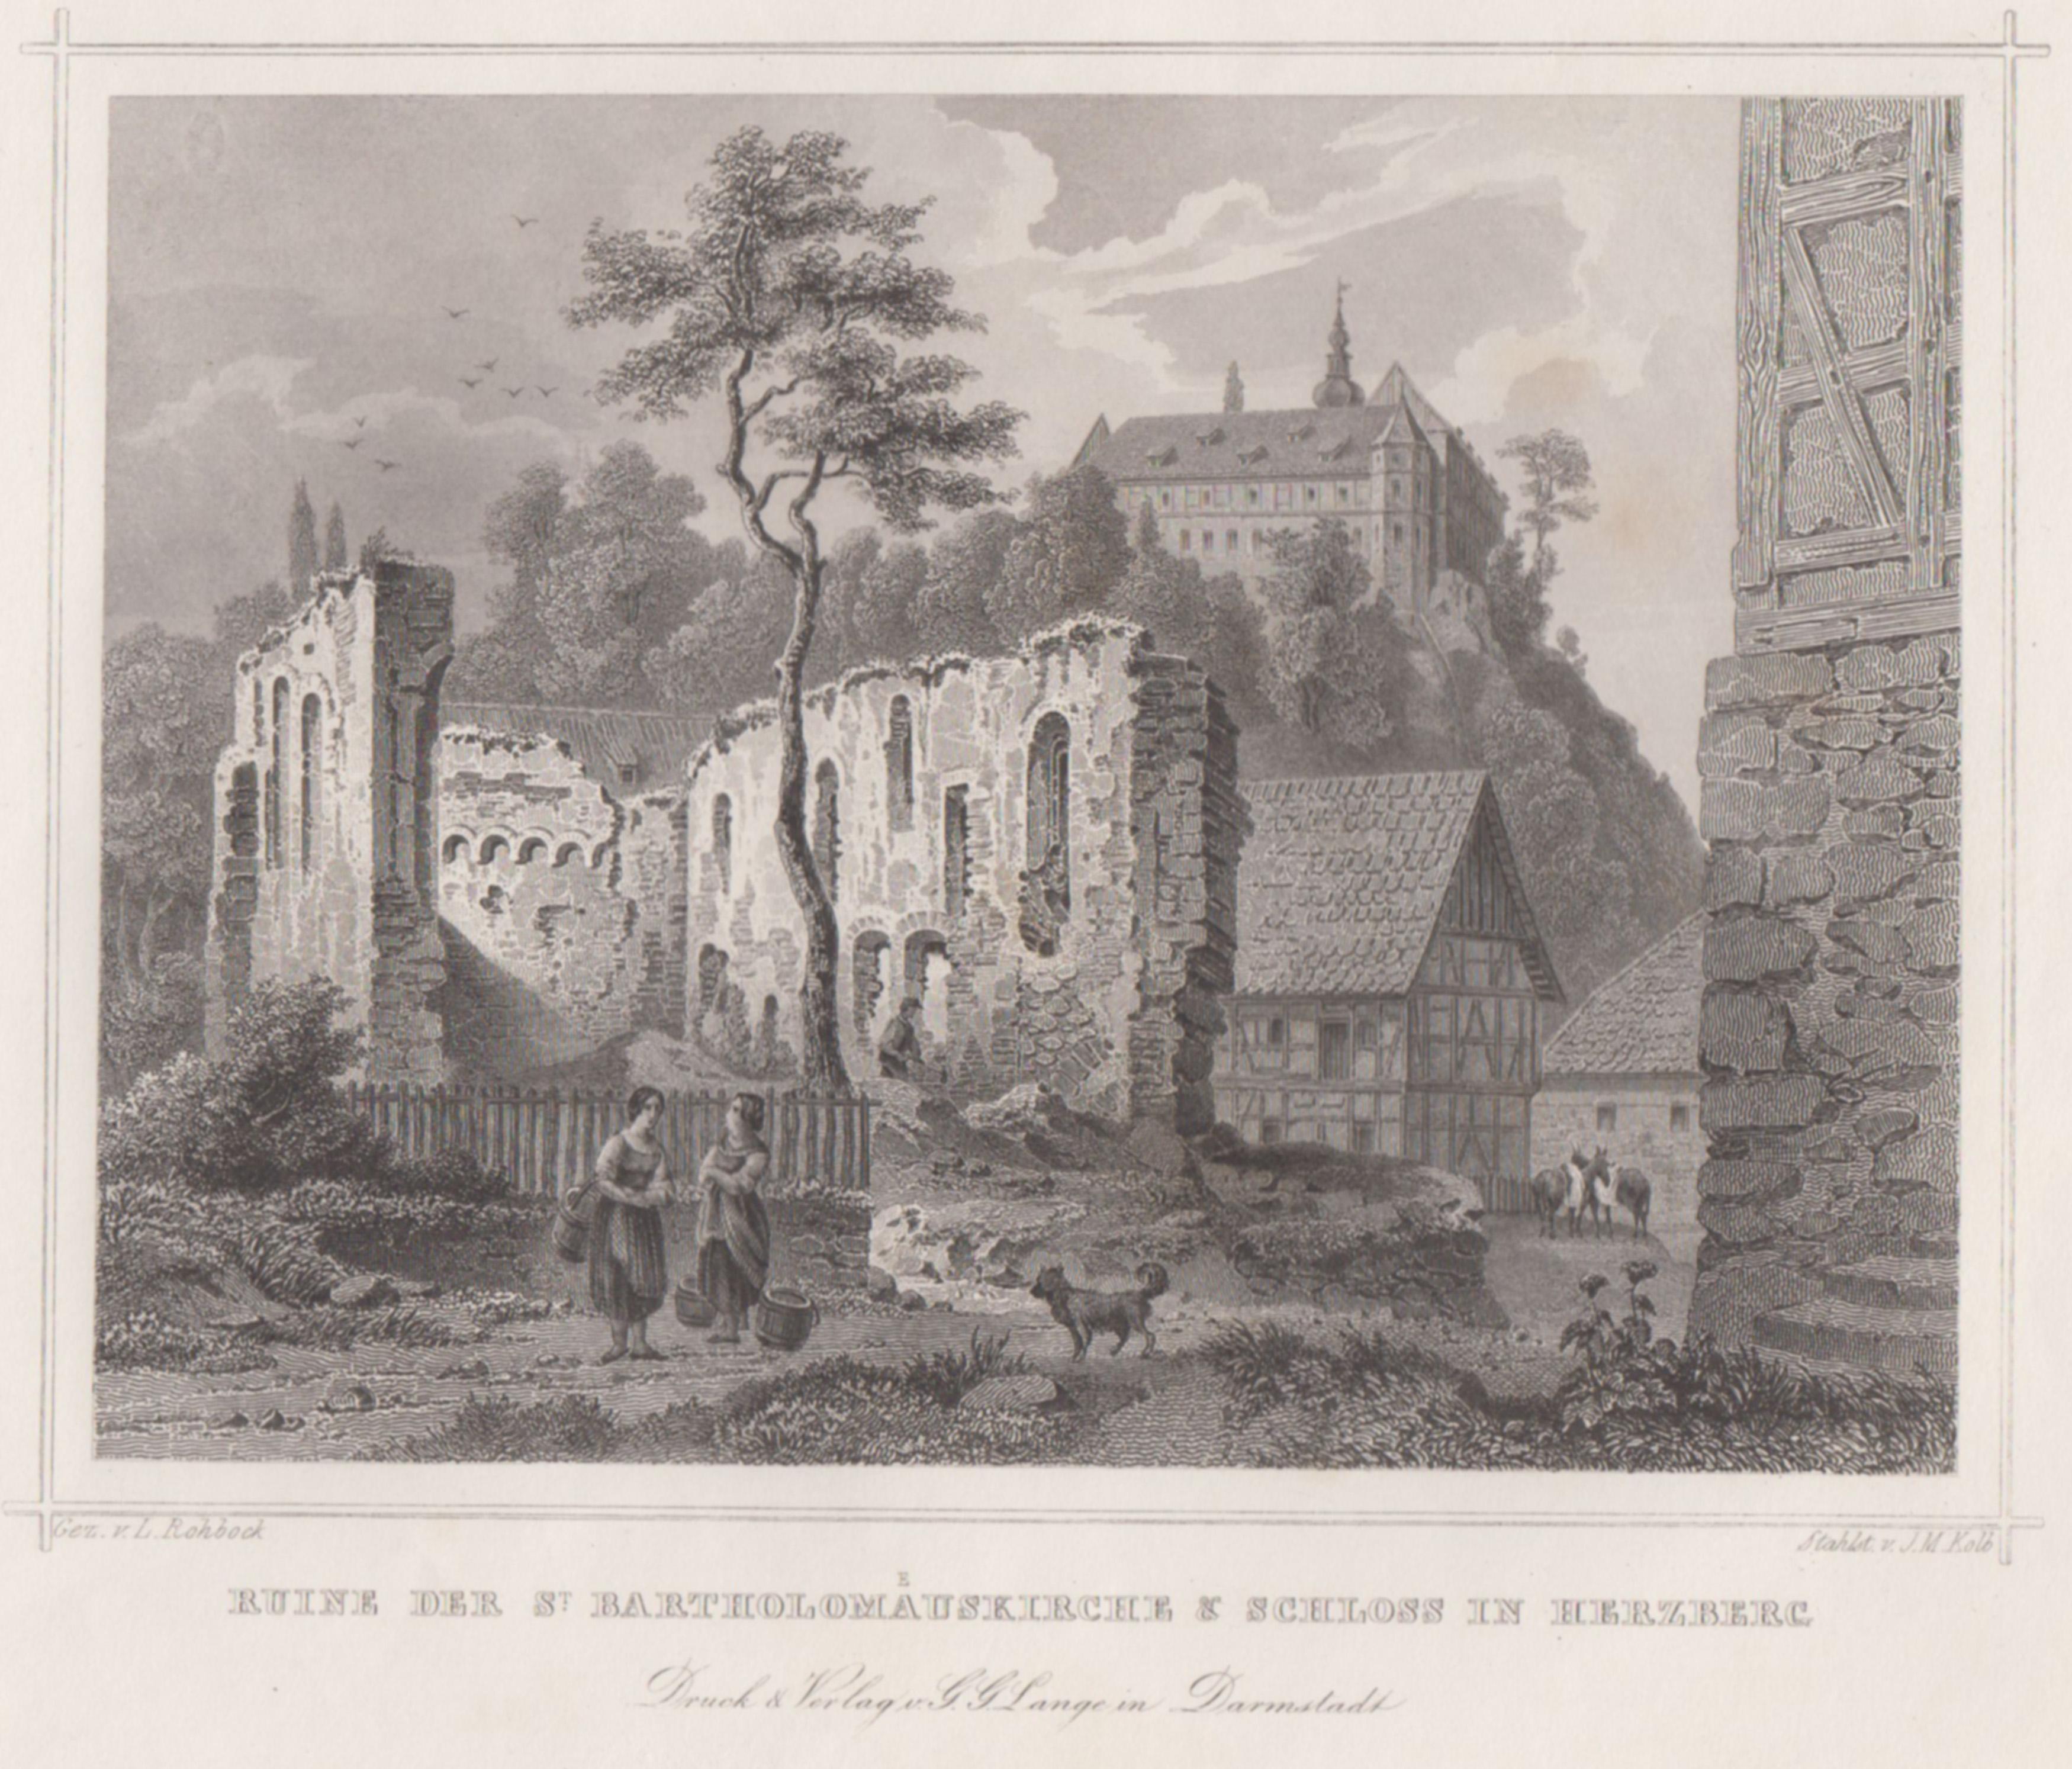 TA., St. Bartholomäuskirche (Ruinenansicht), i. Hgr. das: Herzberg Am Harz: